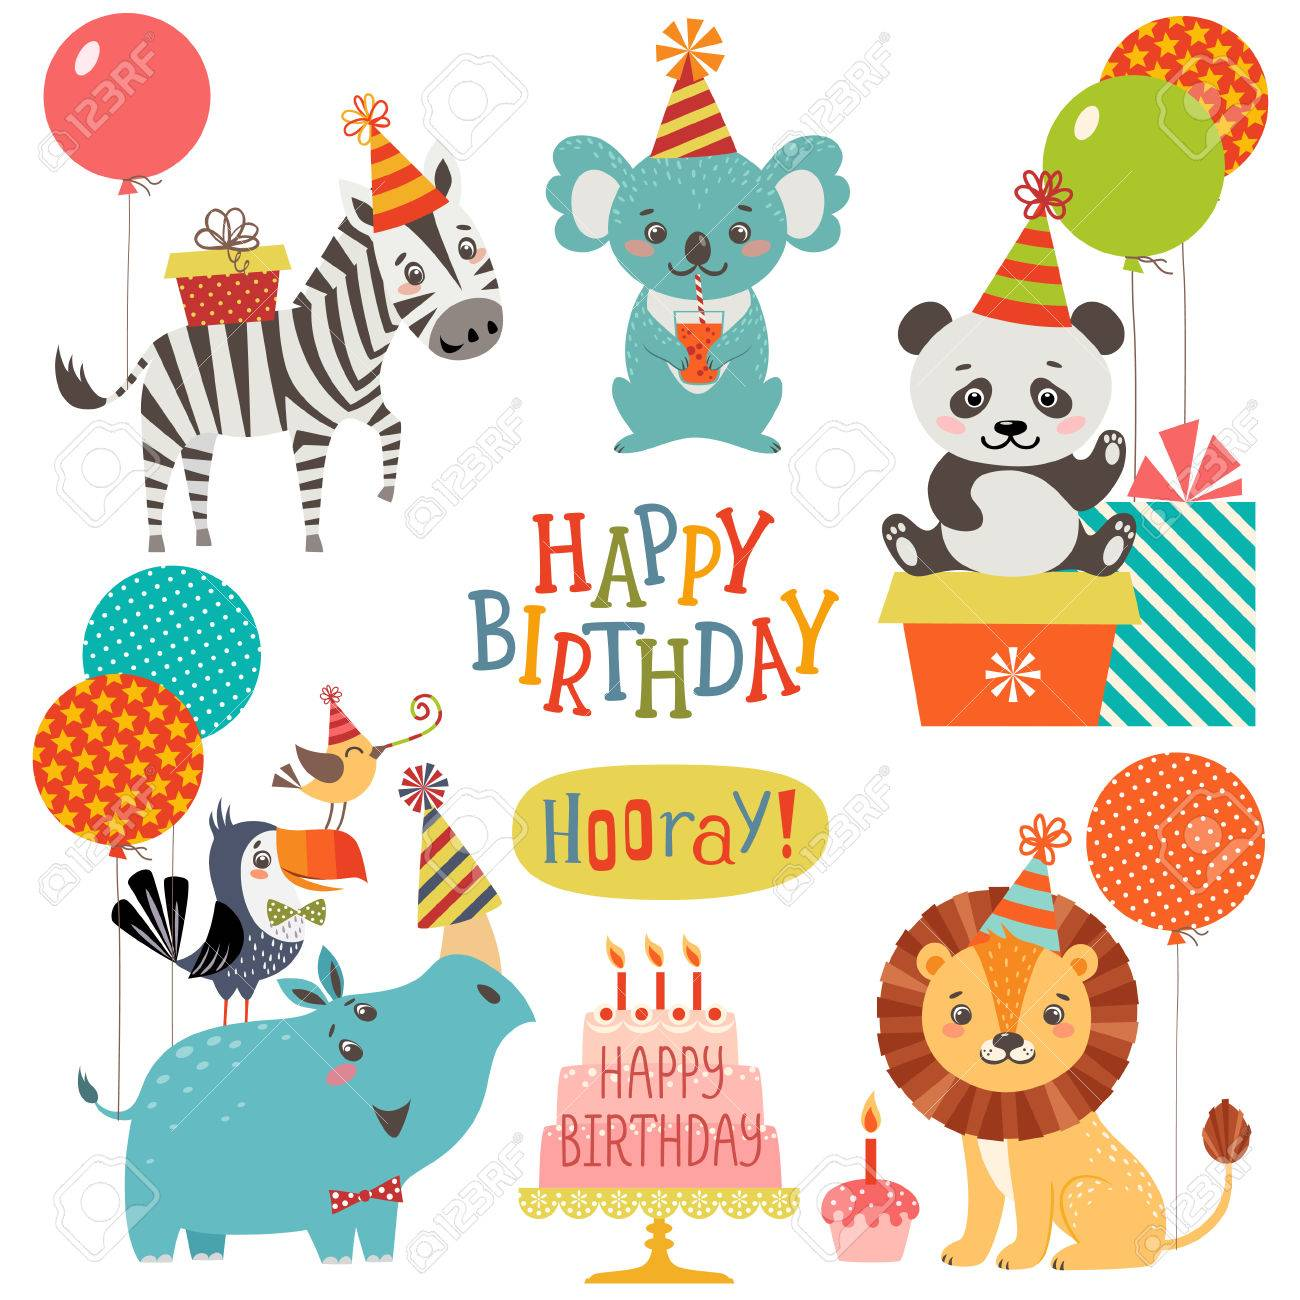 Set of cute animals for birthday design - 54421871